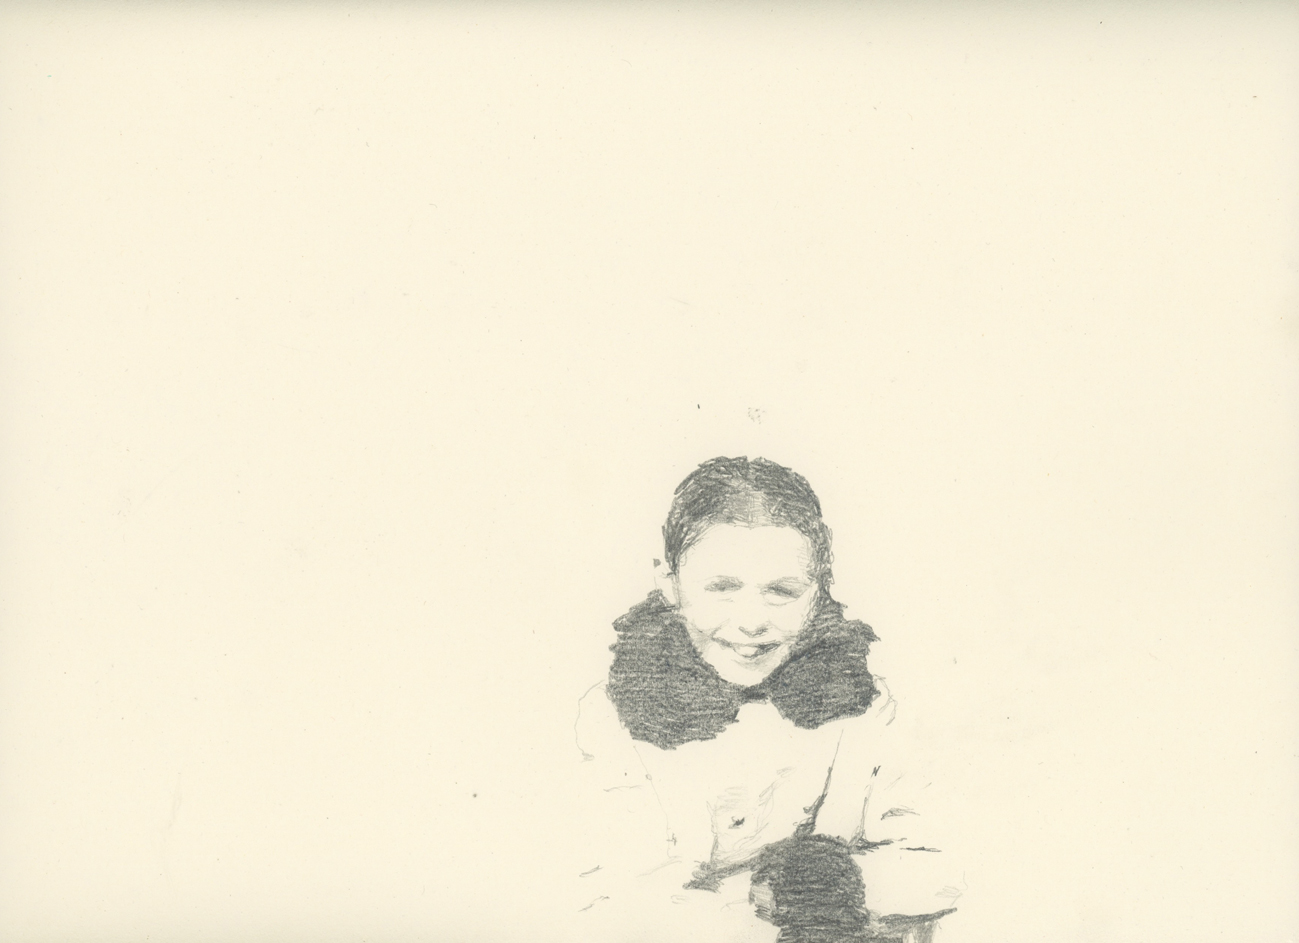 09_-Valentina-D-Accardi-Edda-matita-su-carta-35x24cm copia